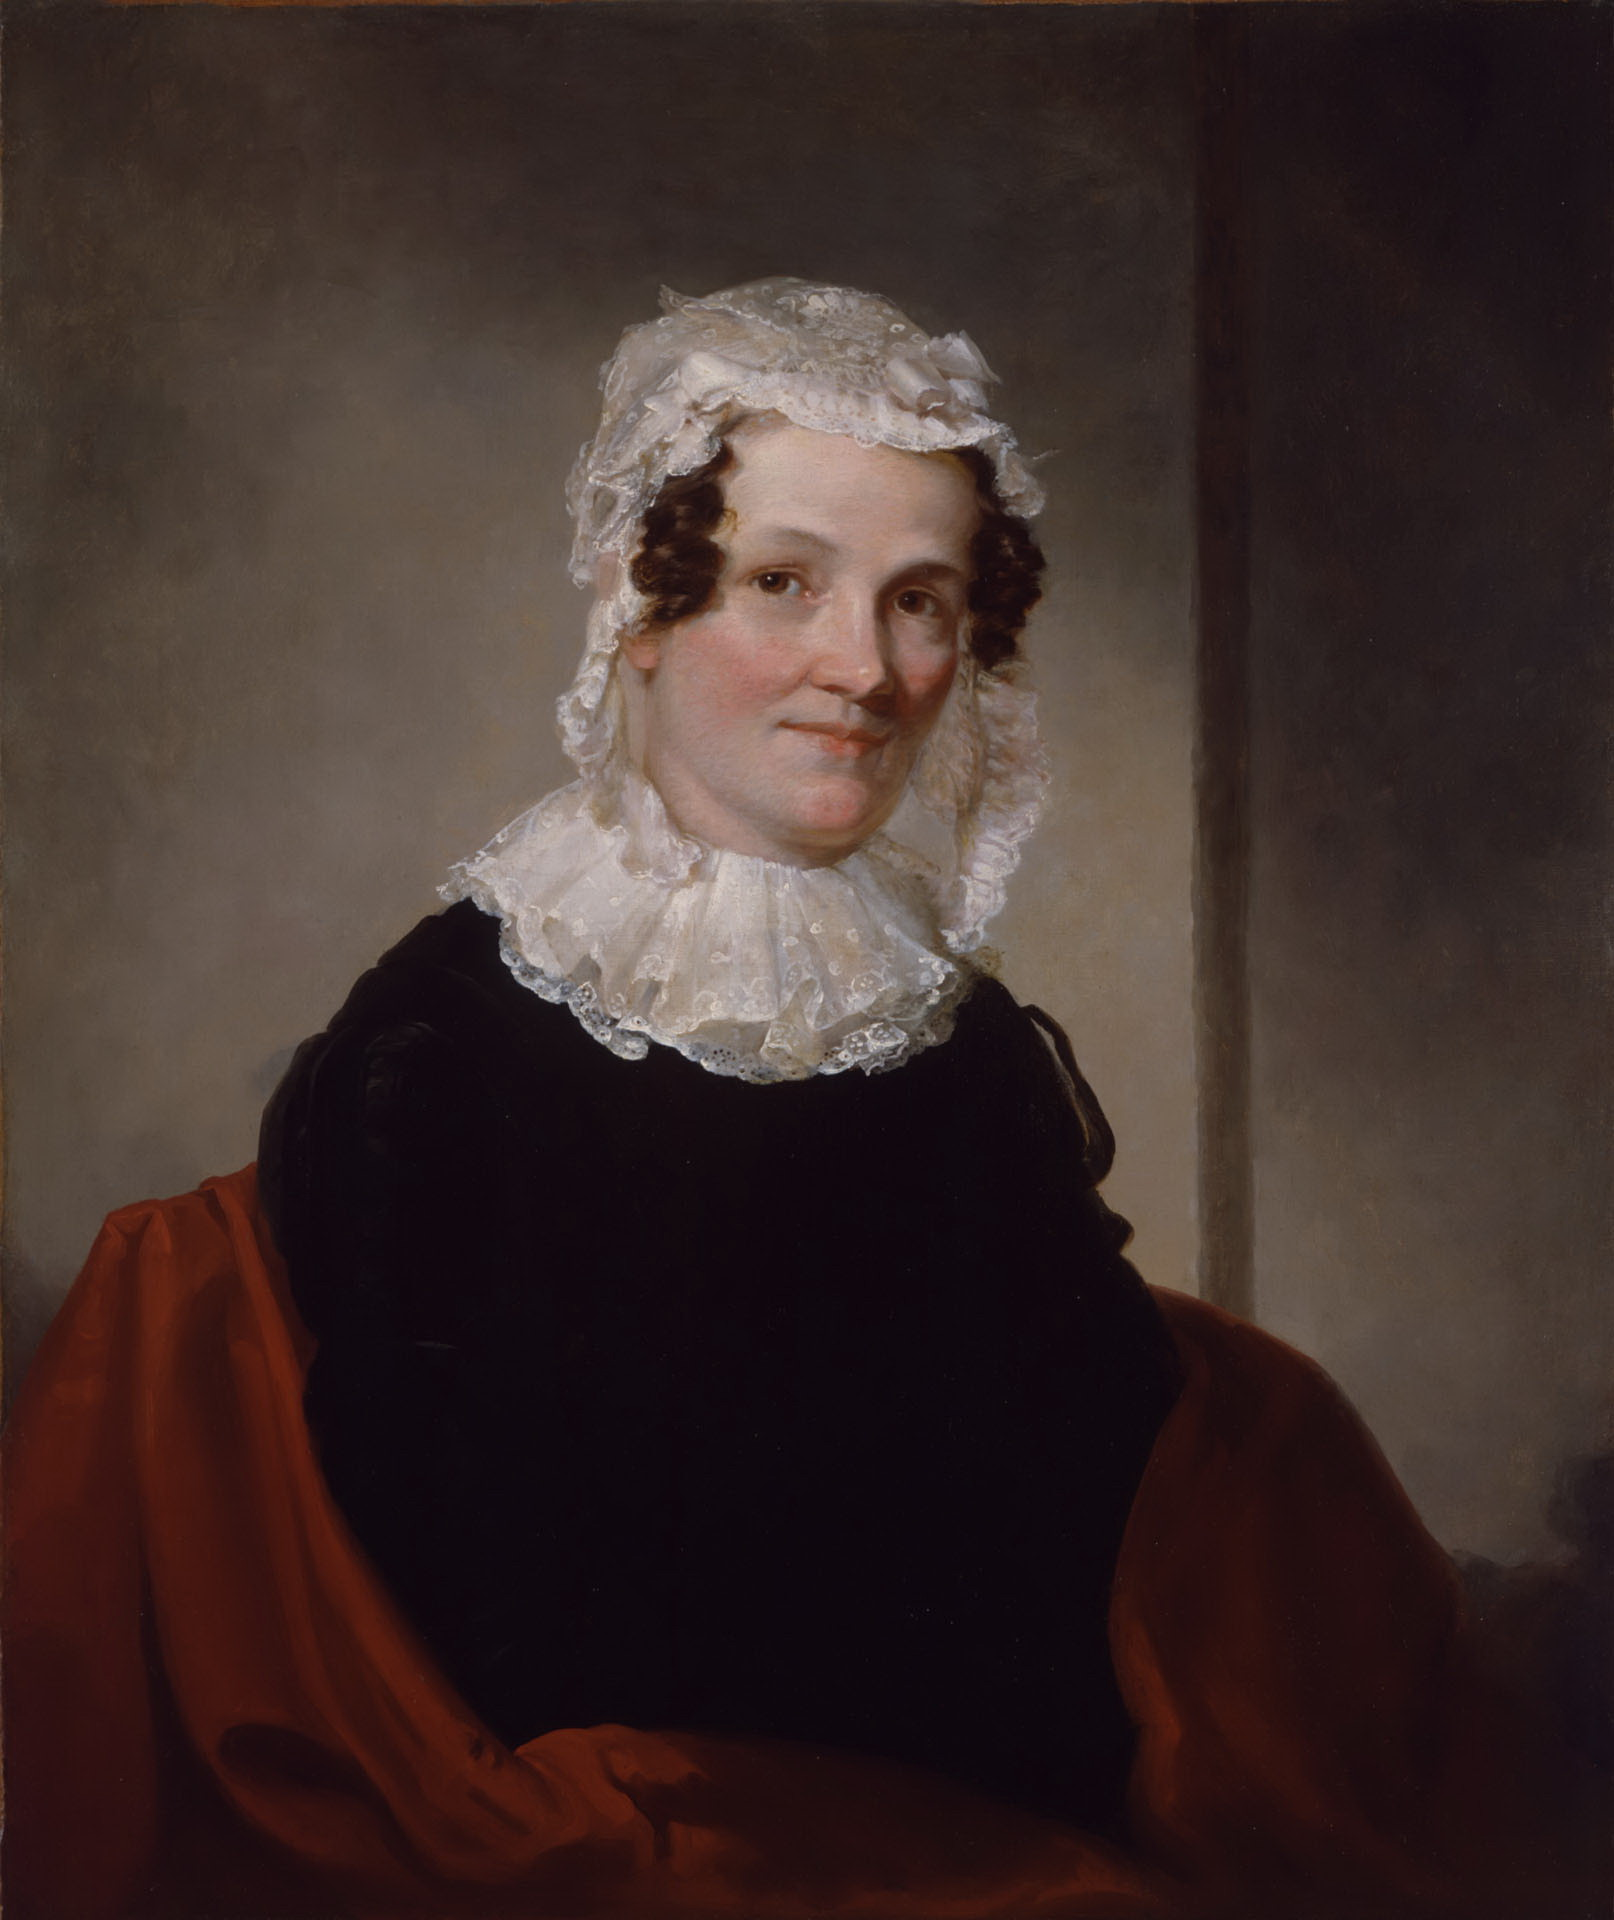 Lydia Coit